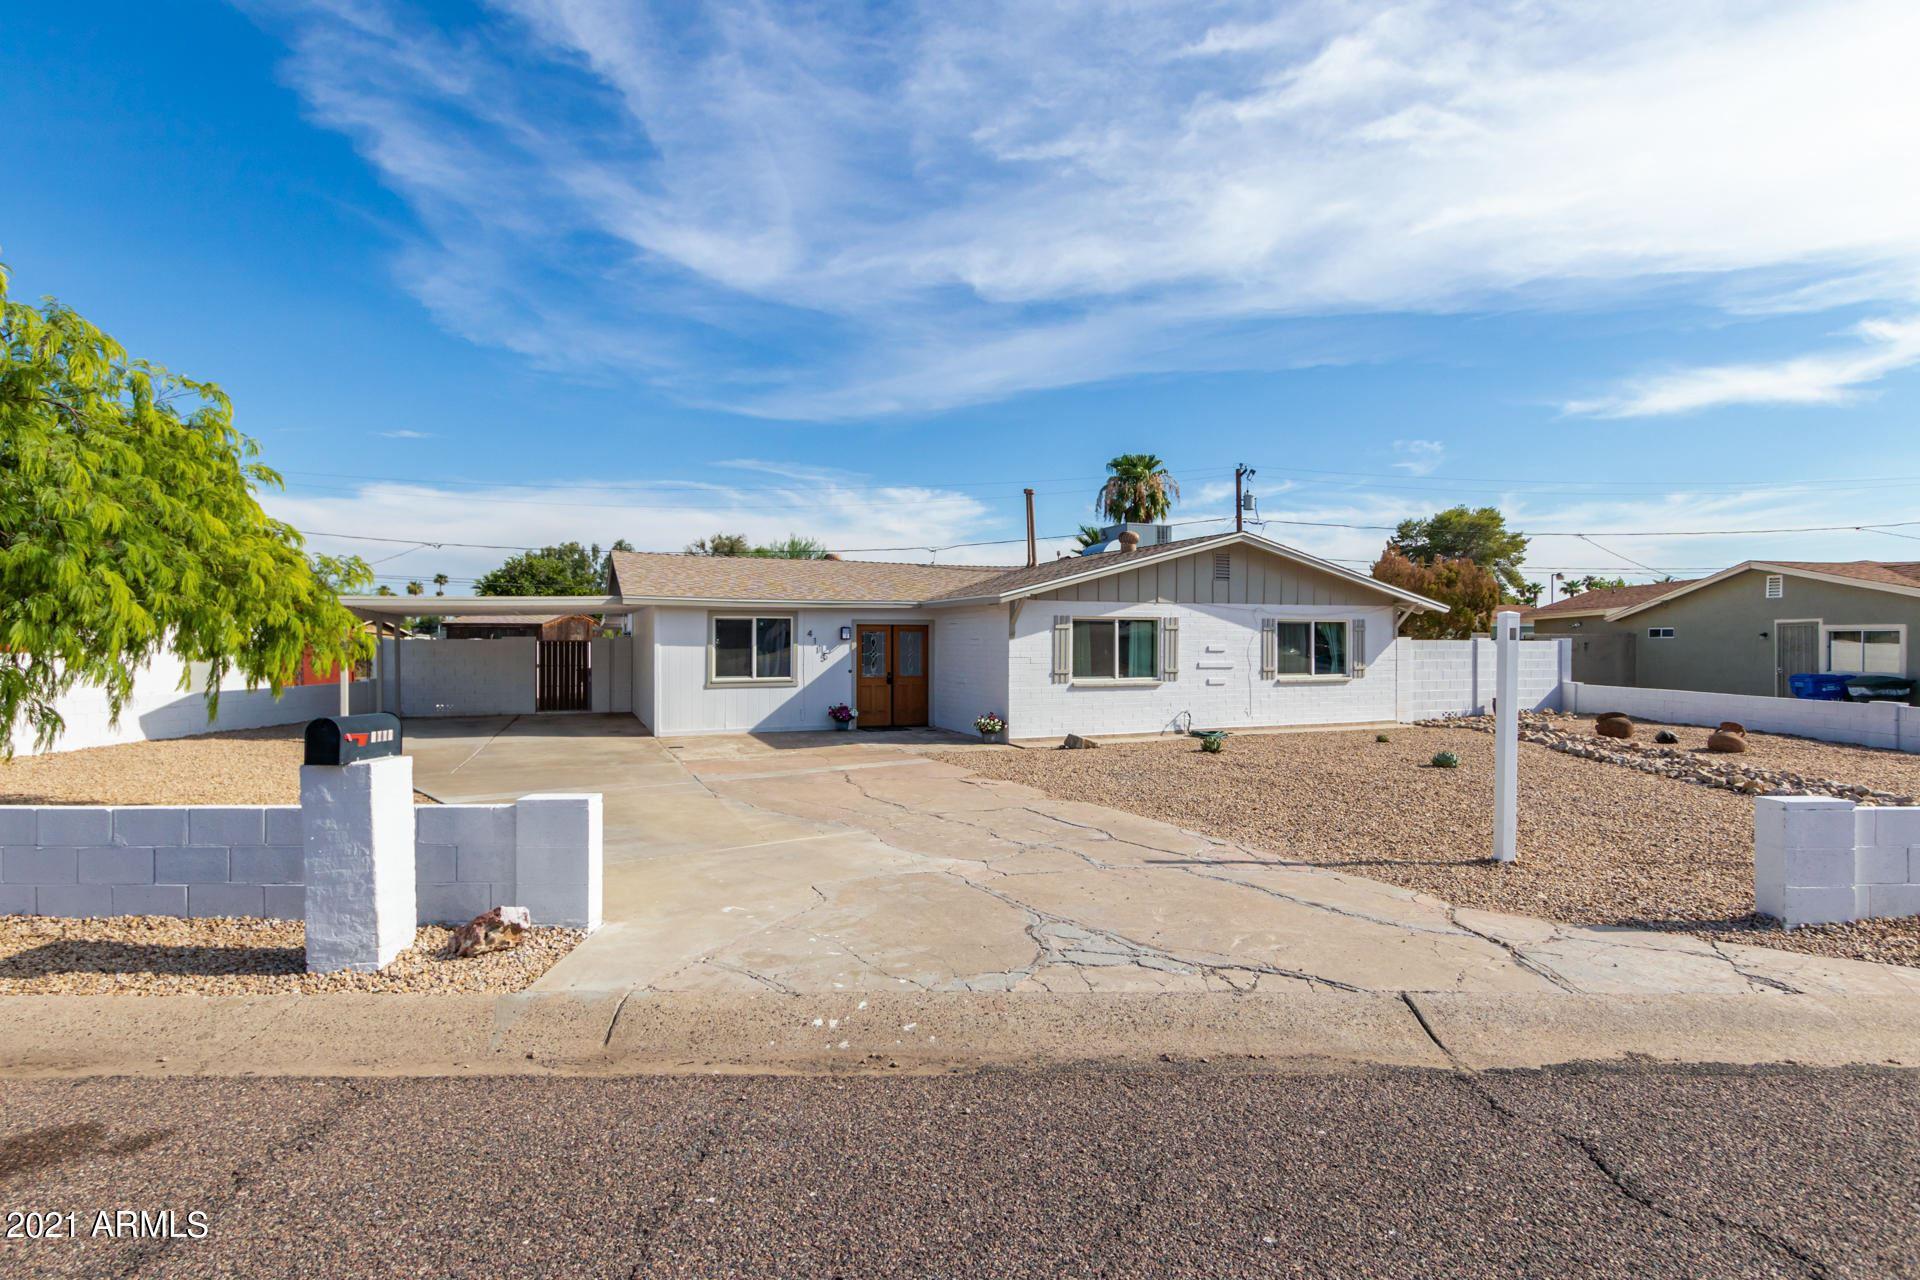 4115 E WAGONER Road, Phoenix, AZ 85032 - MLS#: 6270326